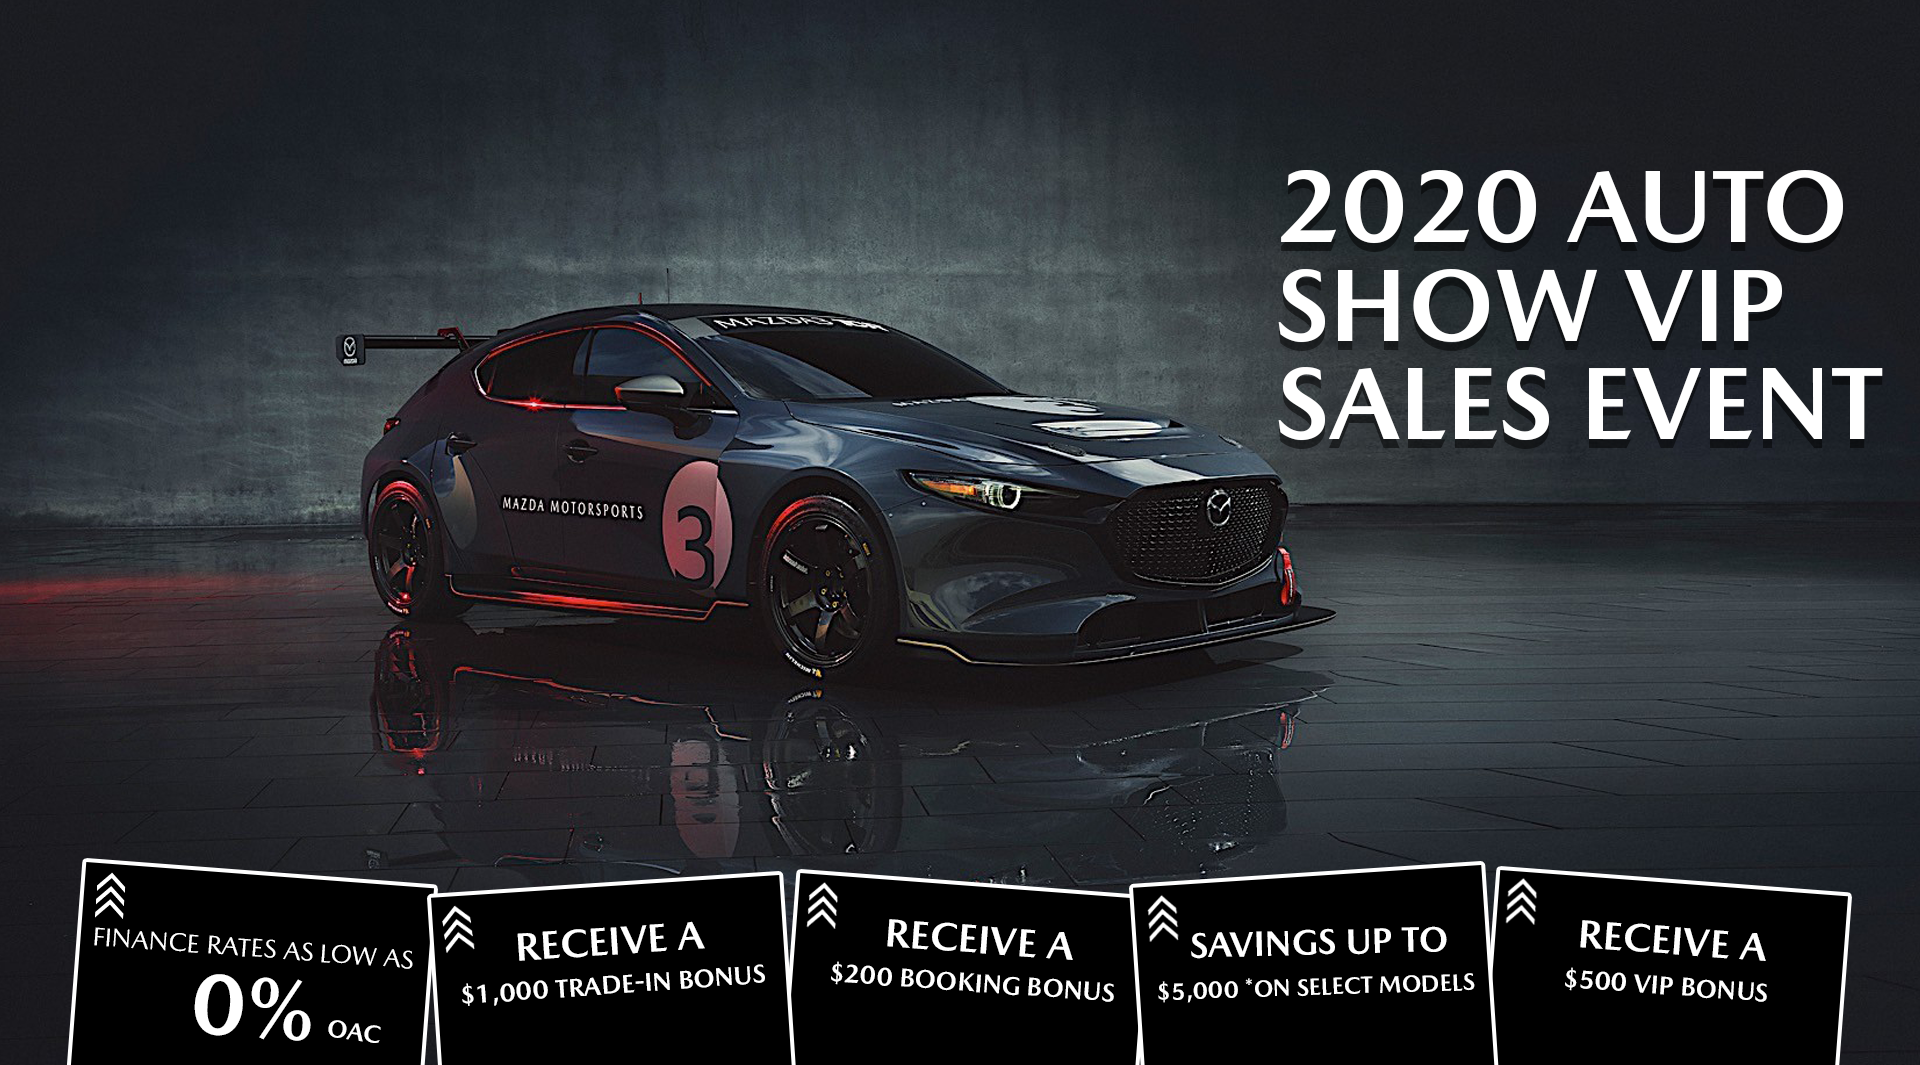 2020 Auto Show VIP Sales Event @ Forest City Mazda